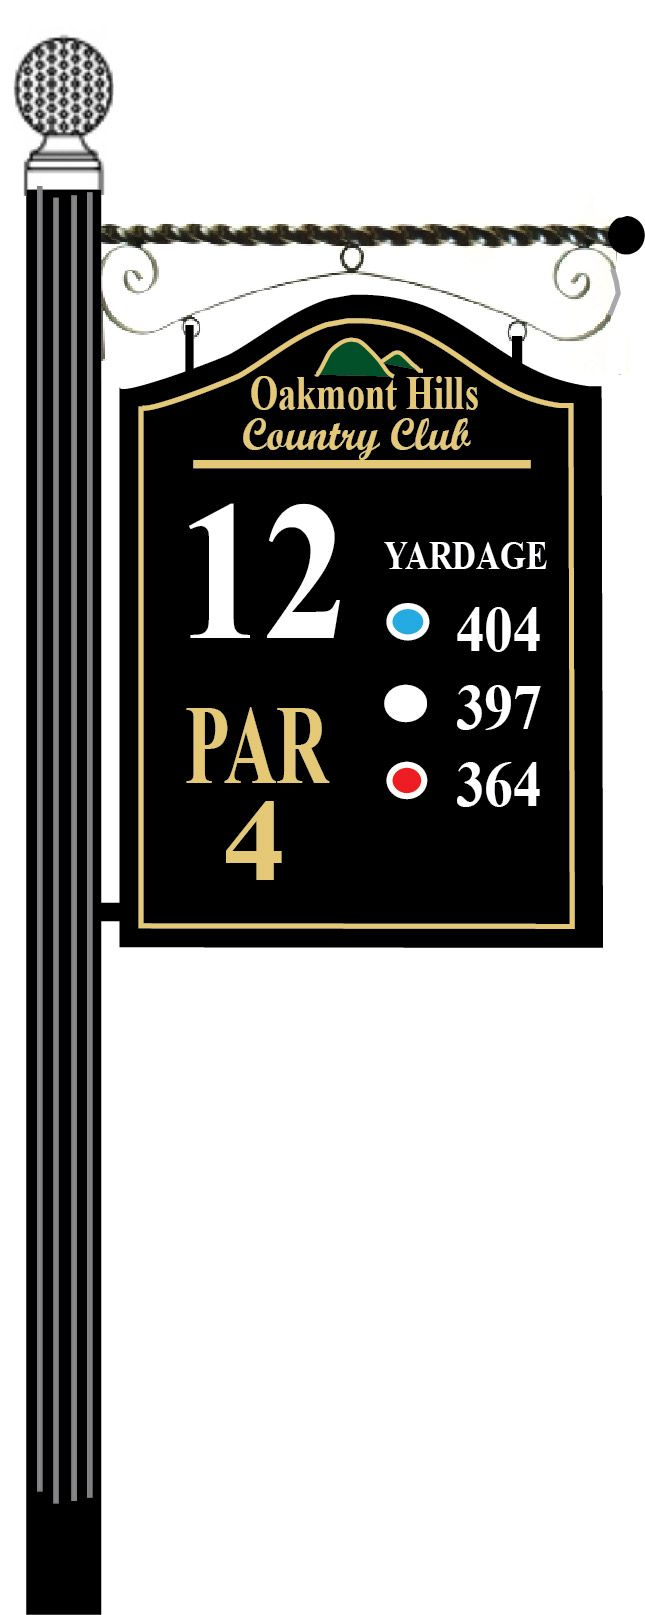 E14347 - Wooden Golf Tee Sign Mounted below Wrought Iron Scroll Bar; Golf Ball Finial on Top of Aluminum Post